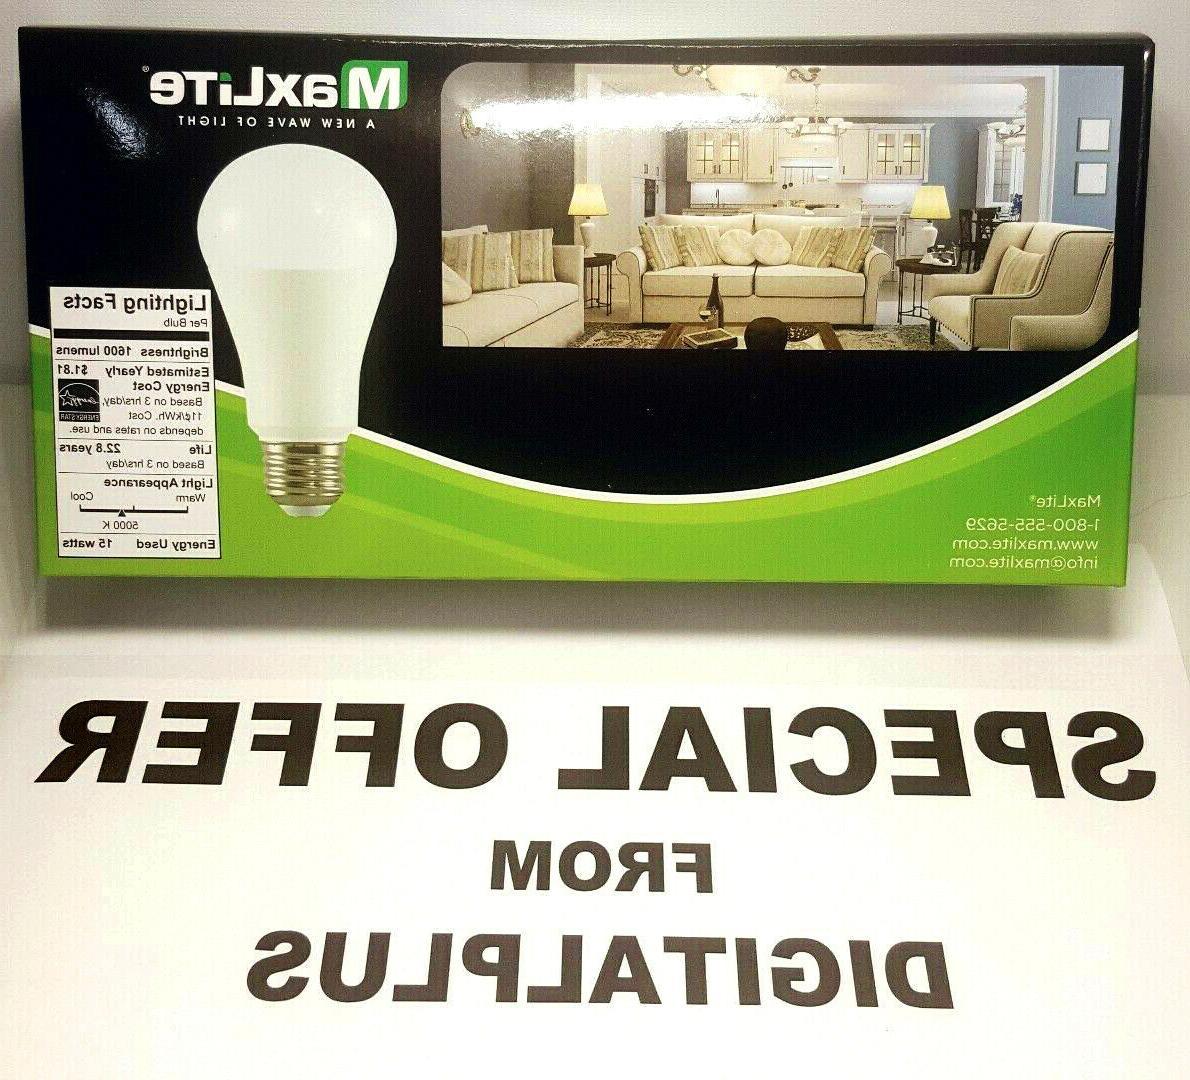 Maxlite LED Light Bulbs Daylight Dimmable 15Watt Watt Equivalent 5000k 5